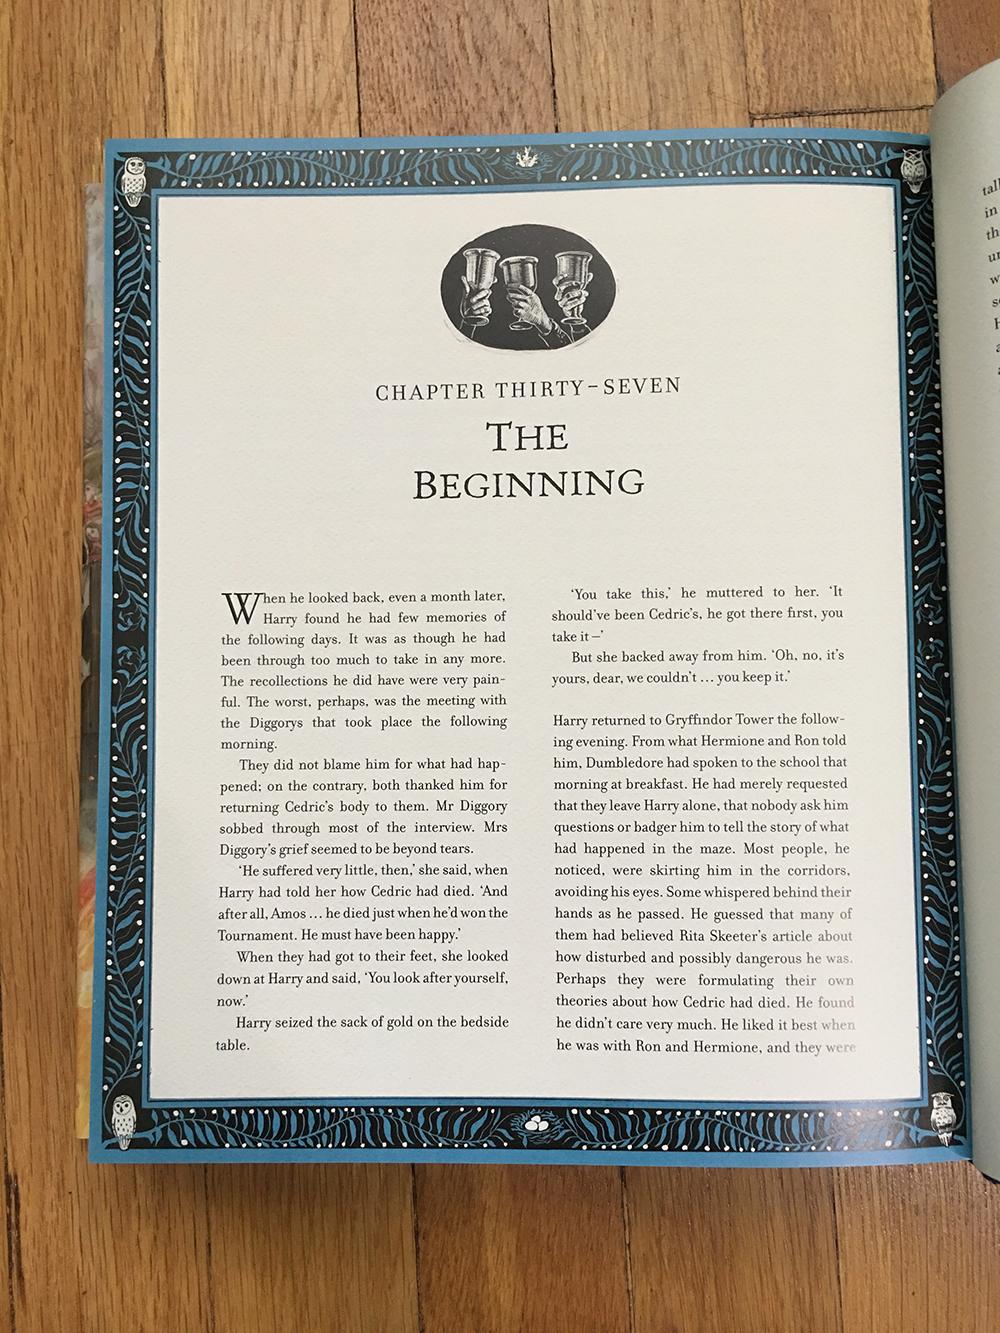 Decorative chapter heading